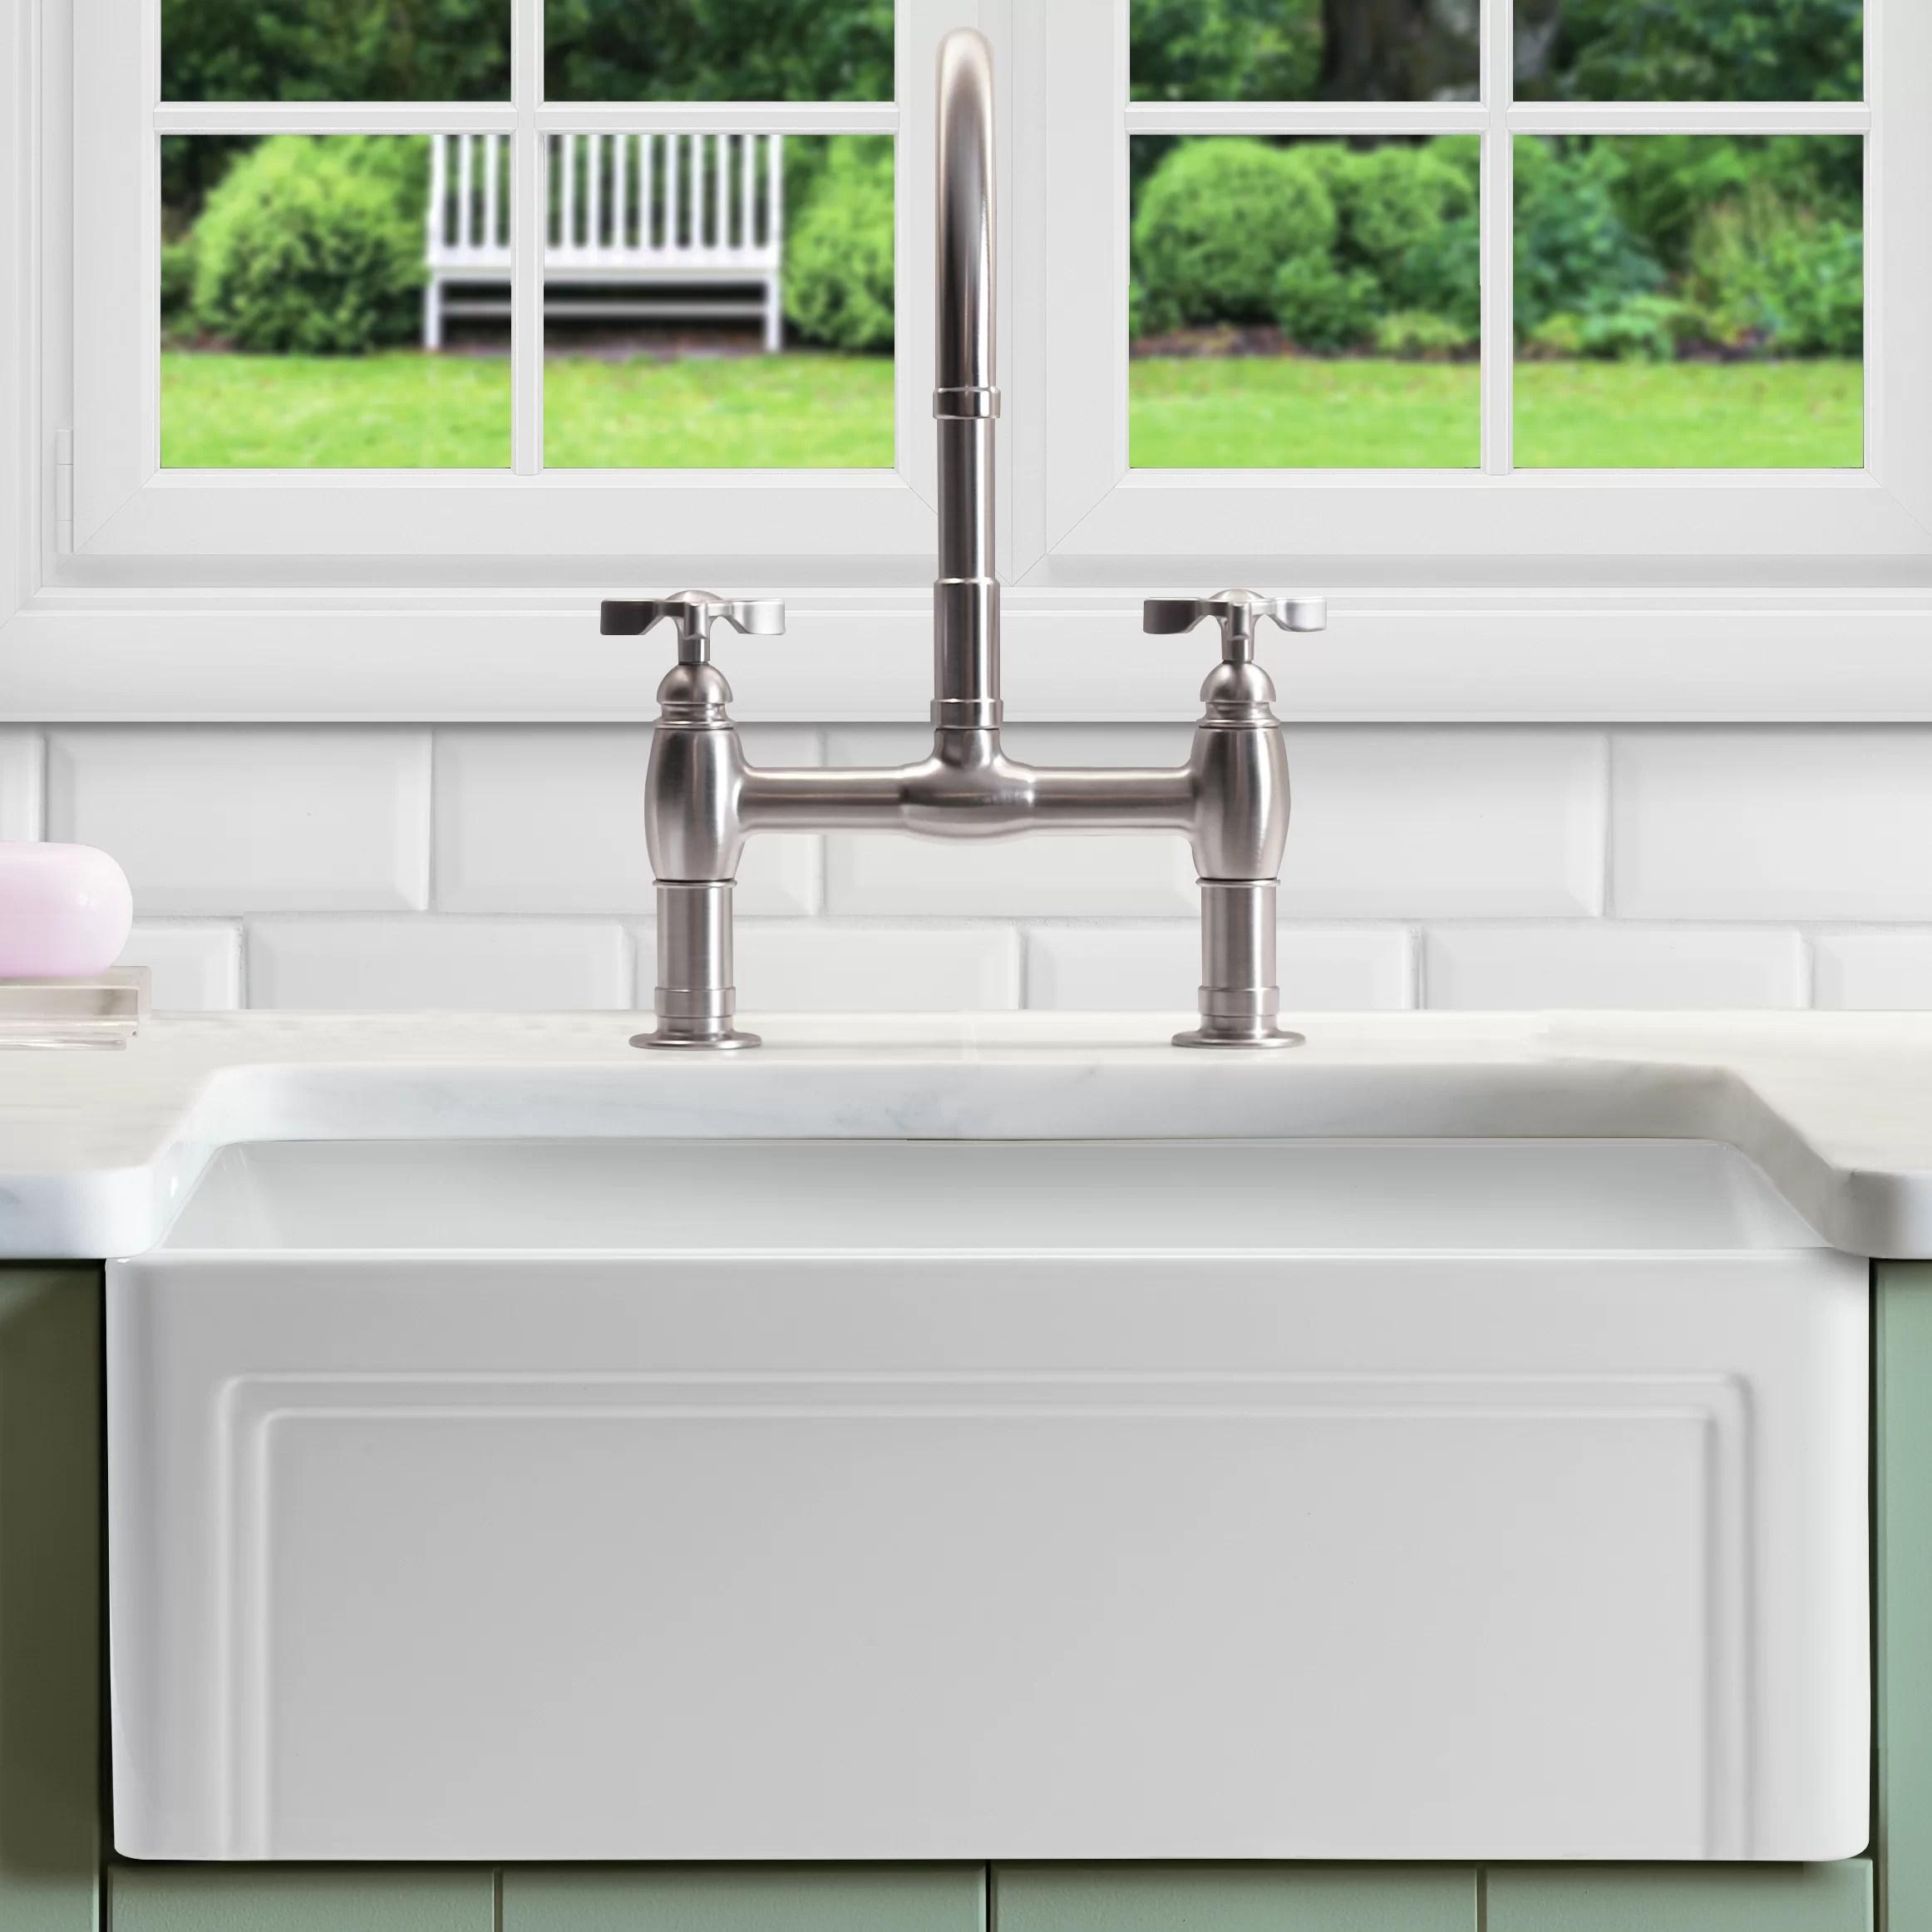 retta 29 l x 18 w farmhouse kitchen sink with grid and strainer